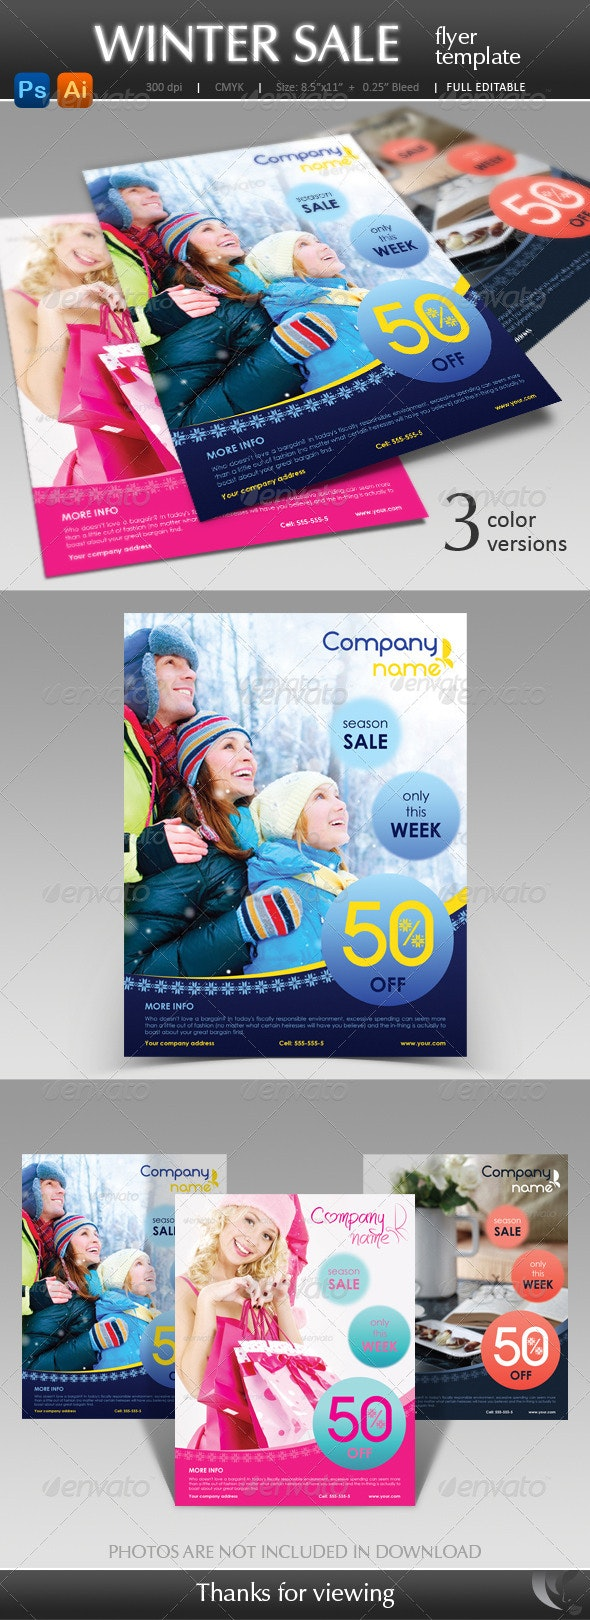 Winter Sale Flyer Template - Corporate Flyers